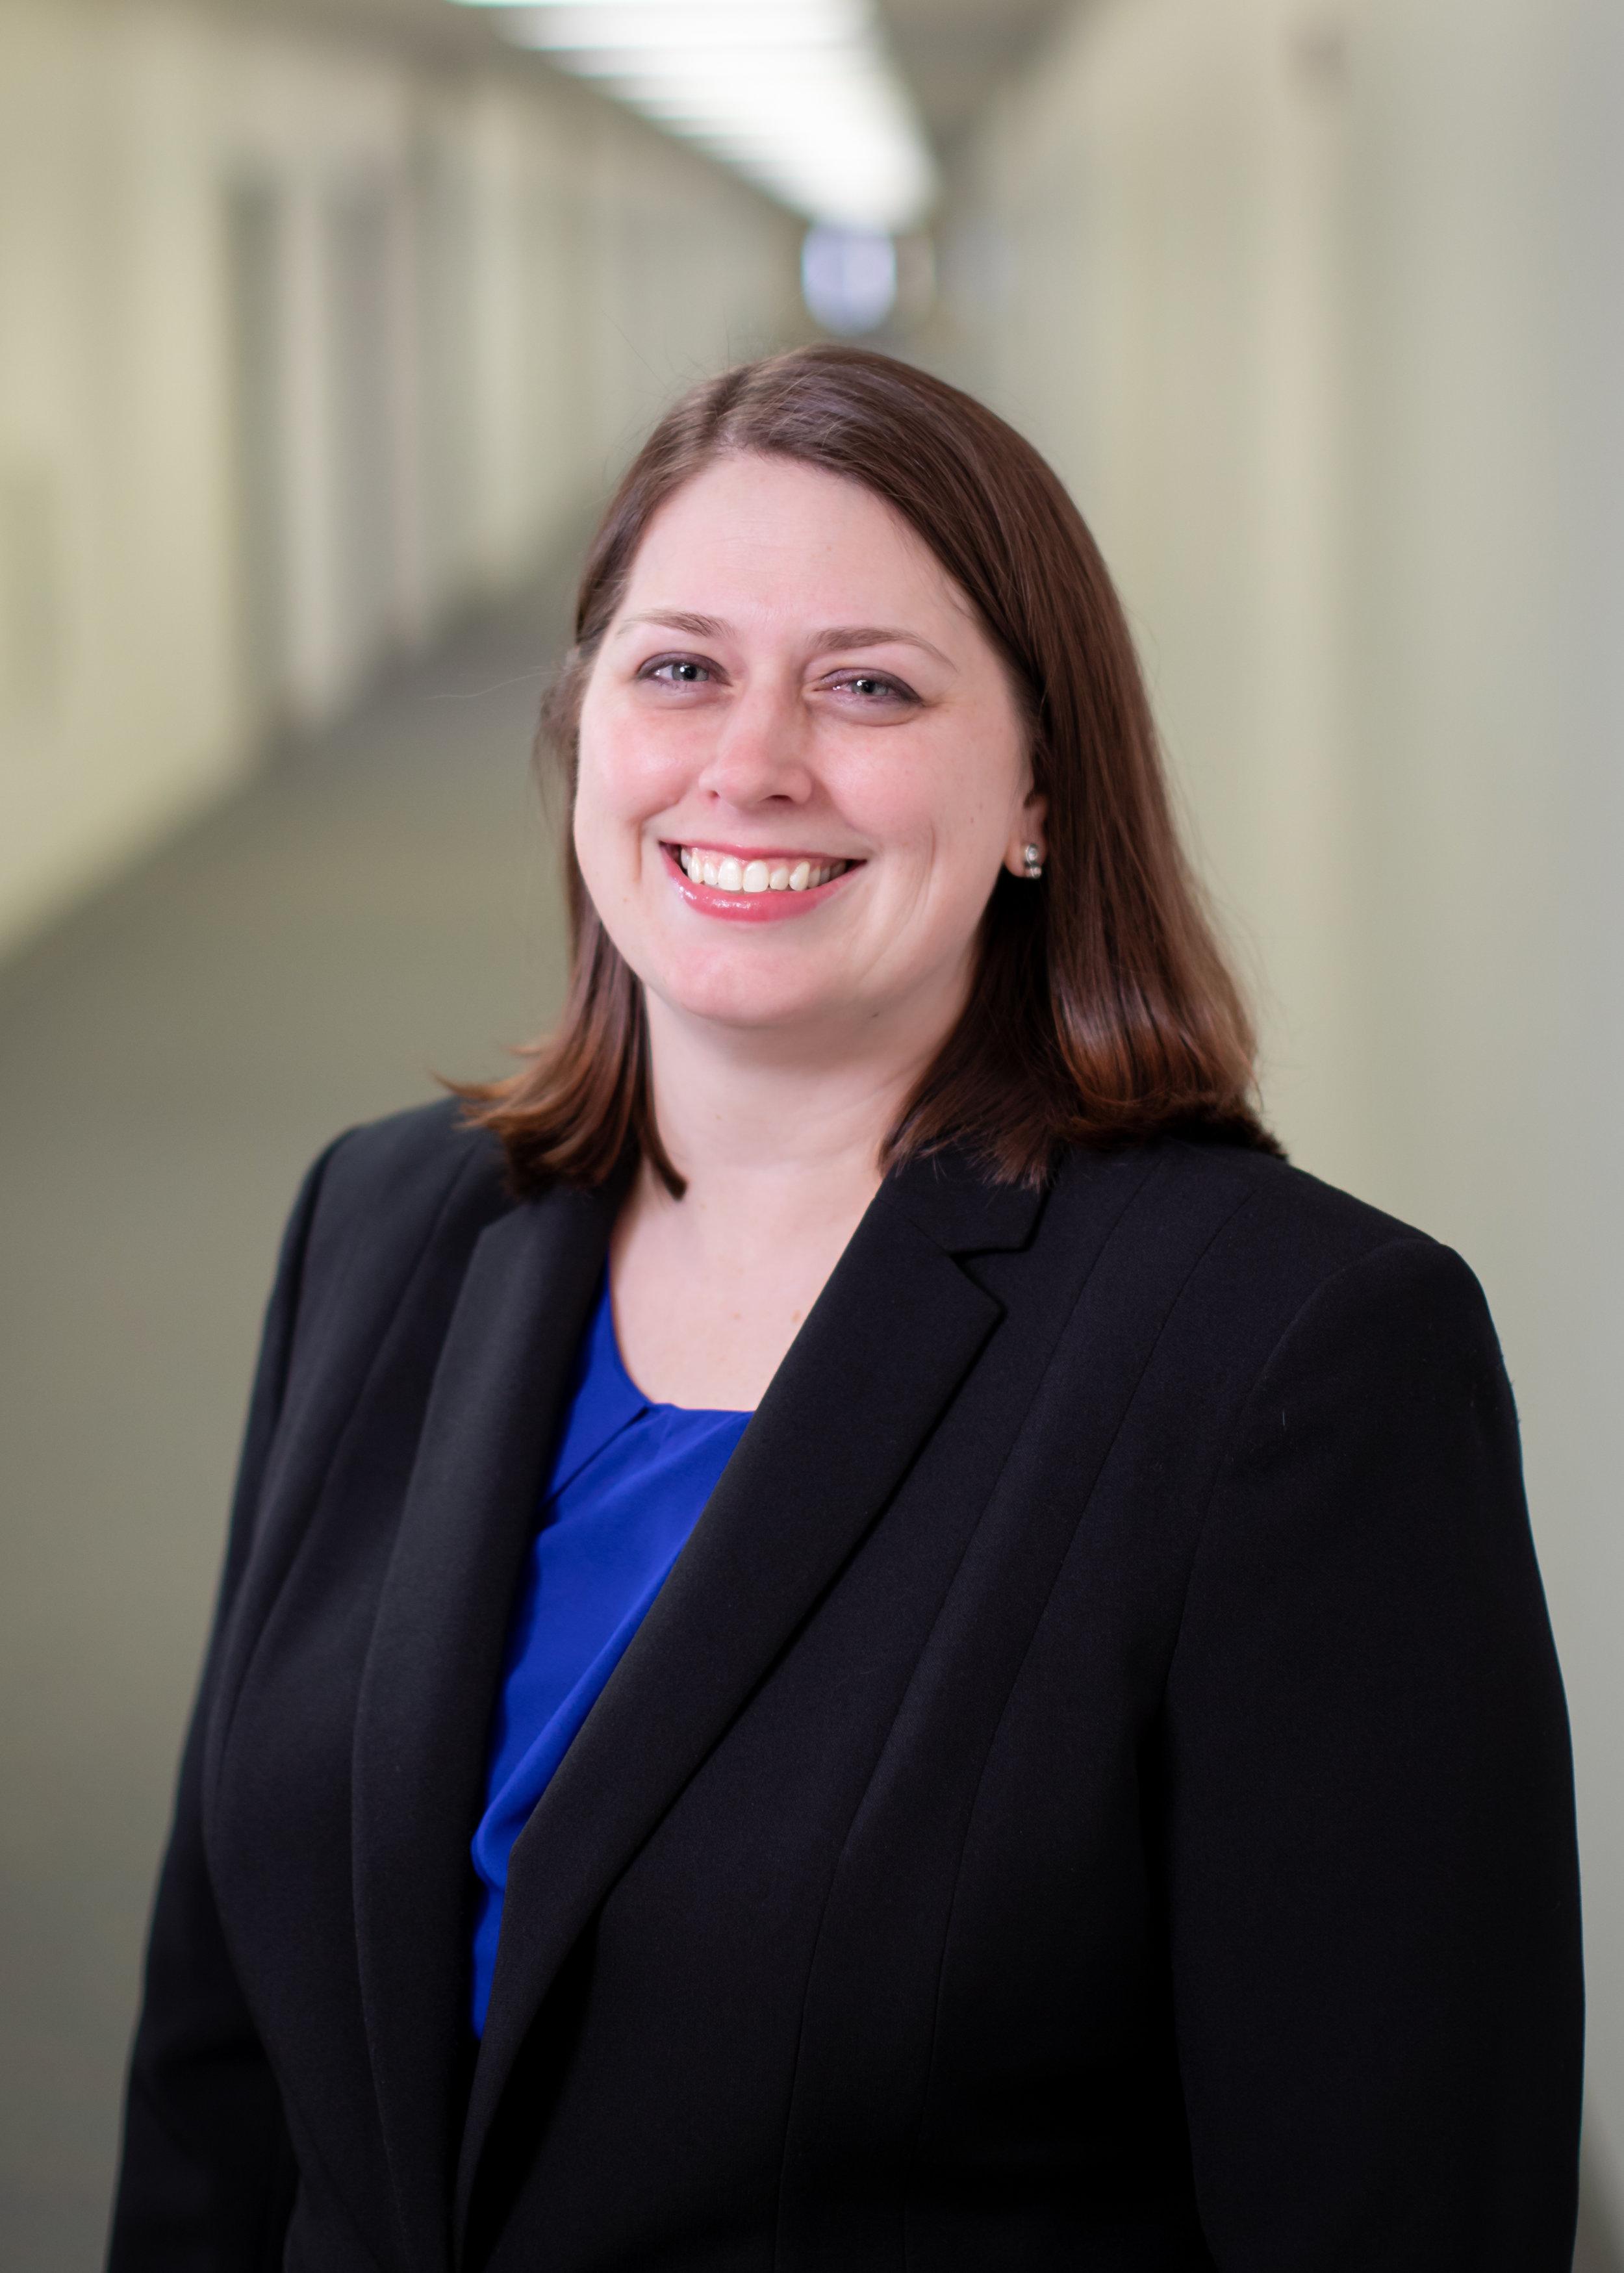 Beth Autrey - Instructional Coach, Academies & CTE